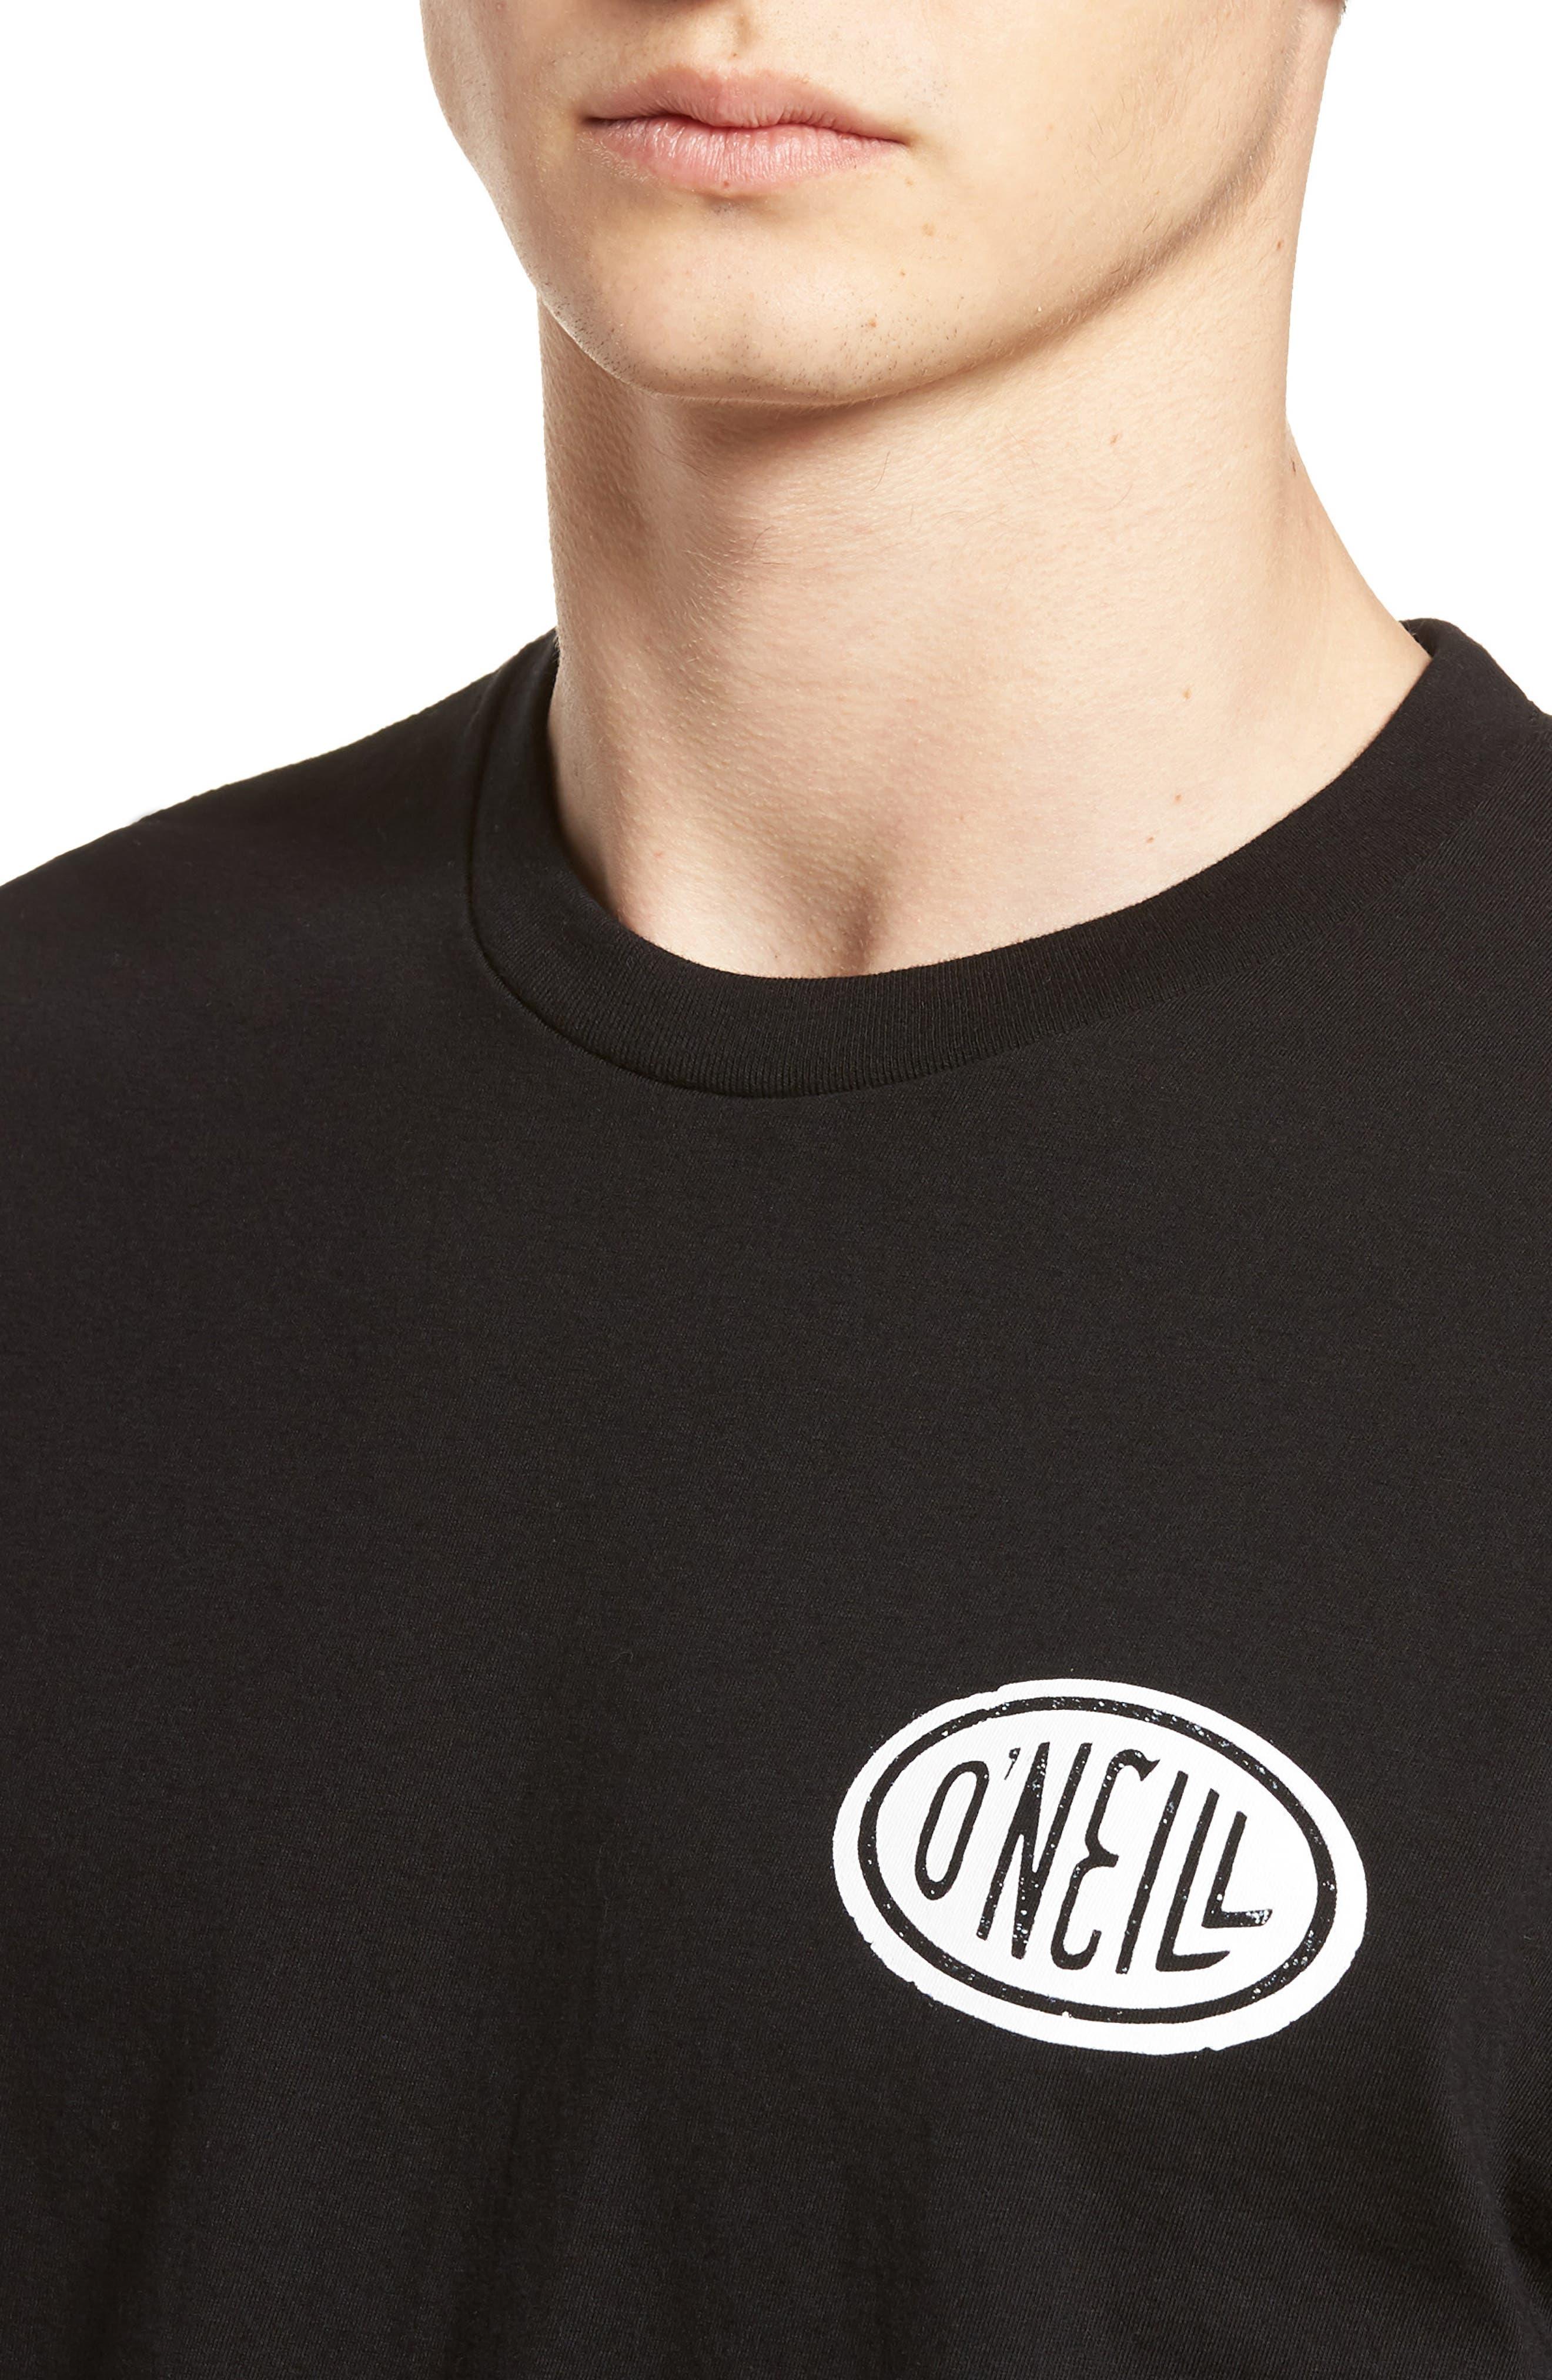 Gasser Graphic T-Shirt,                             Alternate thumbnail 4, color,                             001